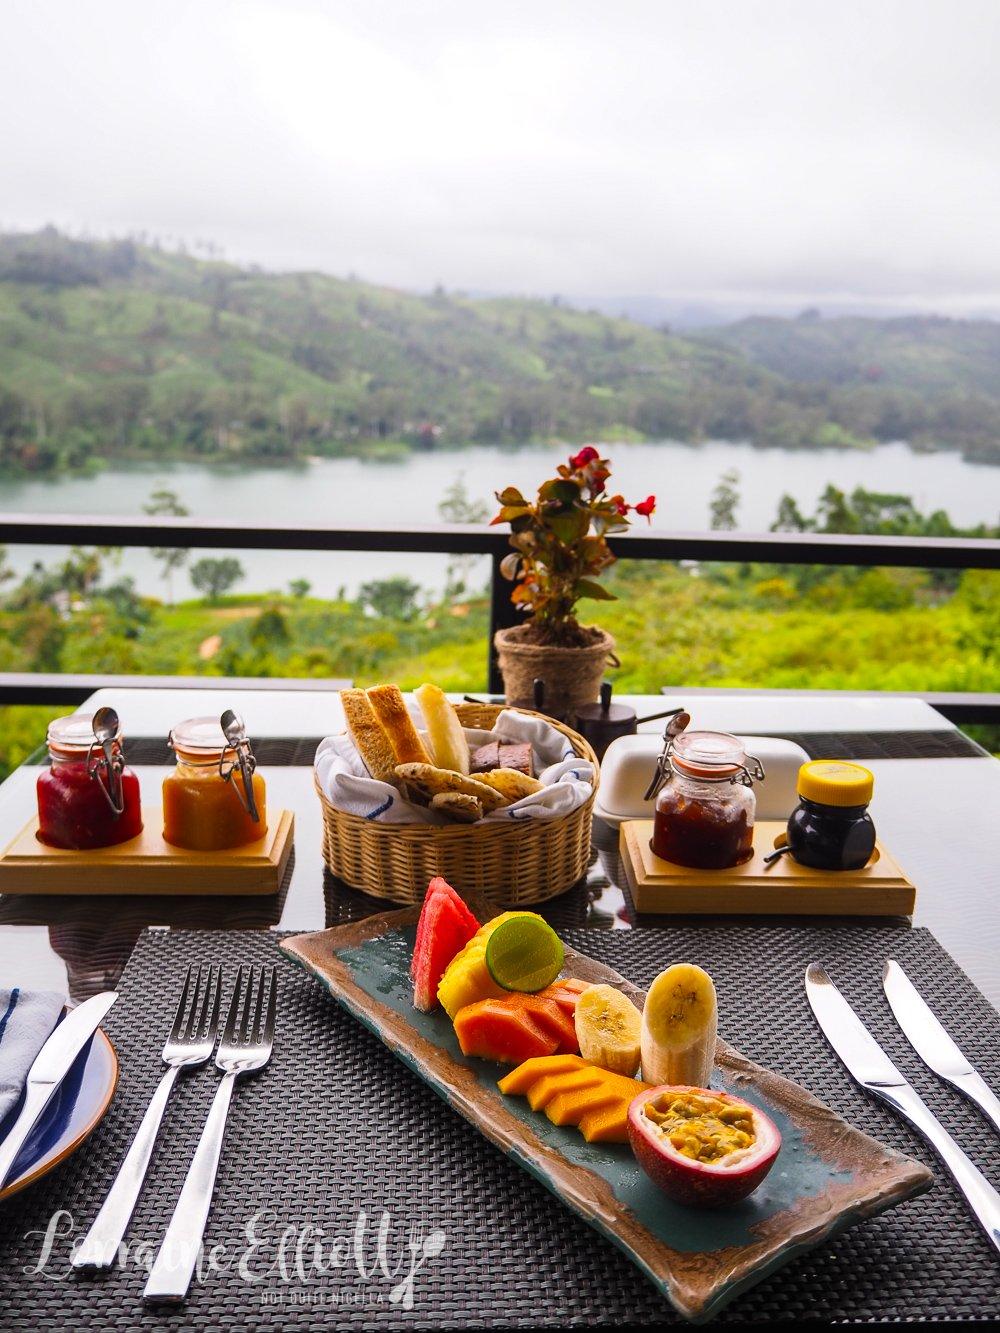 Camellia Hills, Tea Country, Hatton Sri Lanka